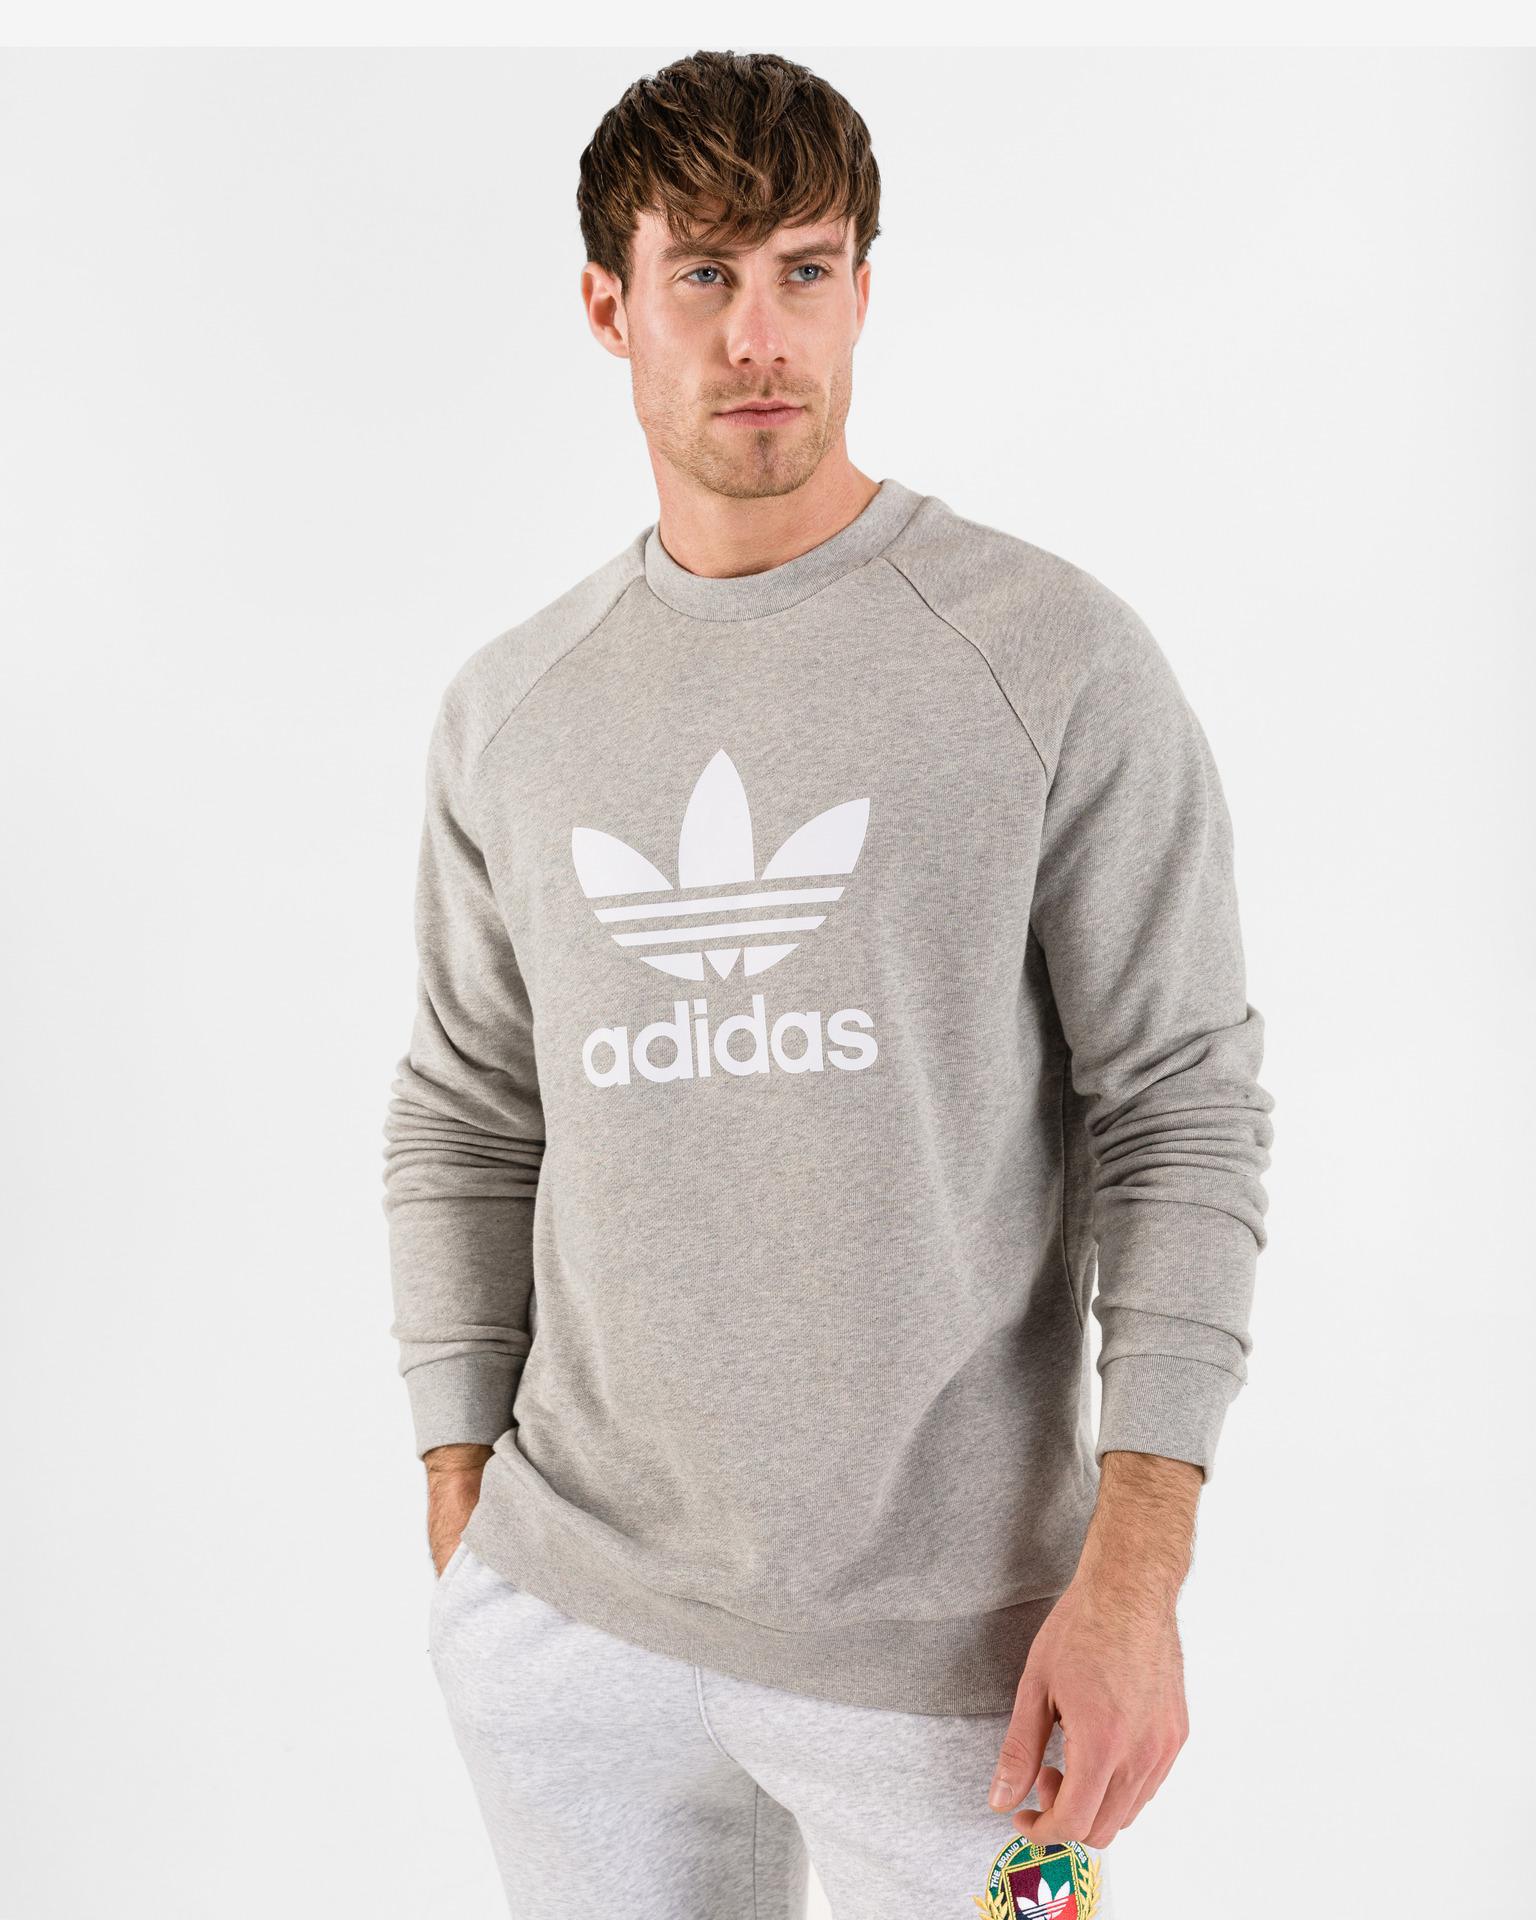 adidas Originals - Trefoil Warm-Up Crew Sweatshirt Bibloo.com